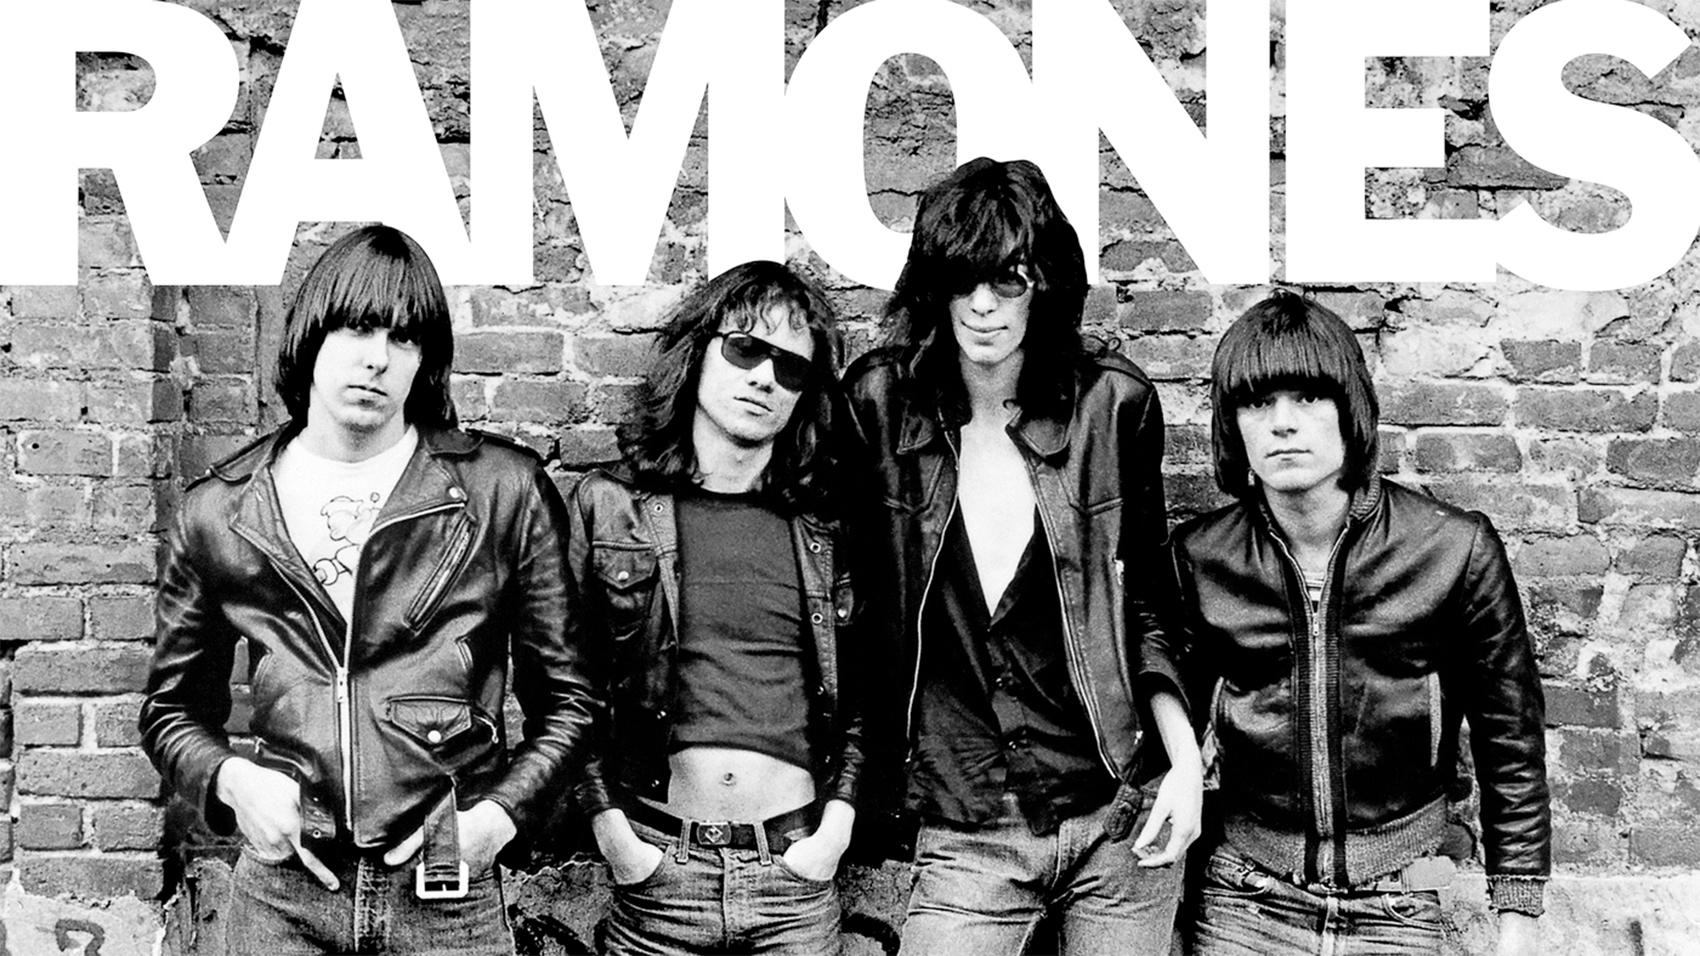 Let's all wish the Ramones' debut album a happy birthday